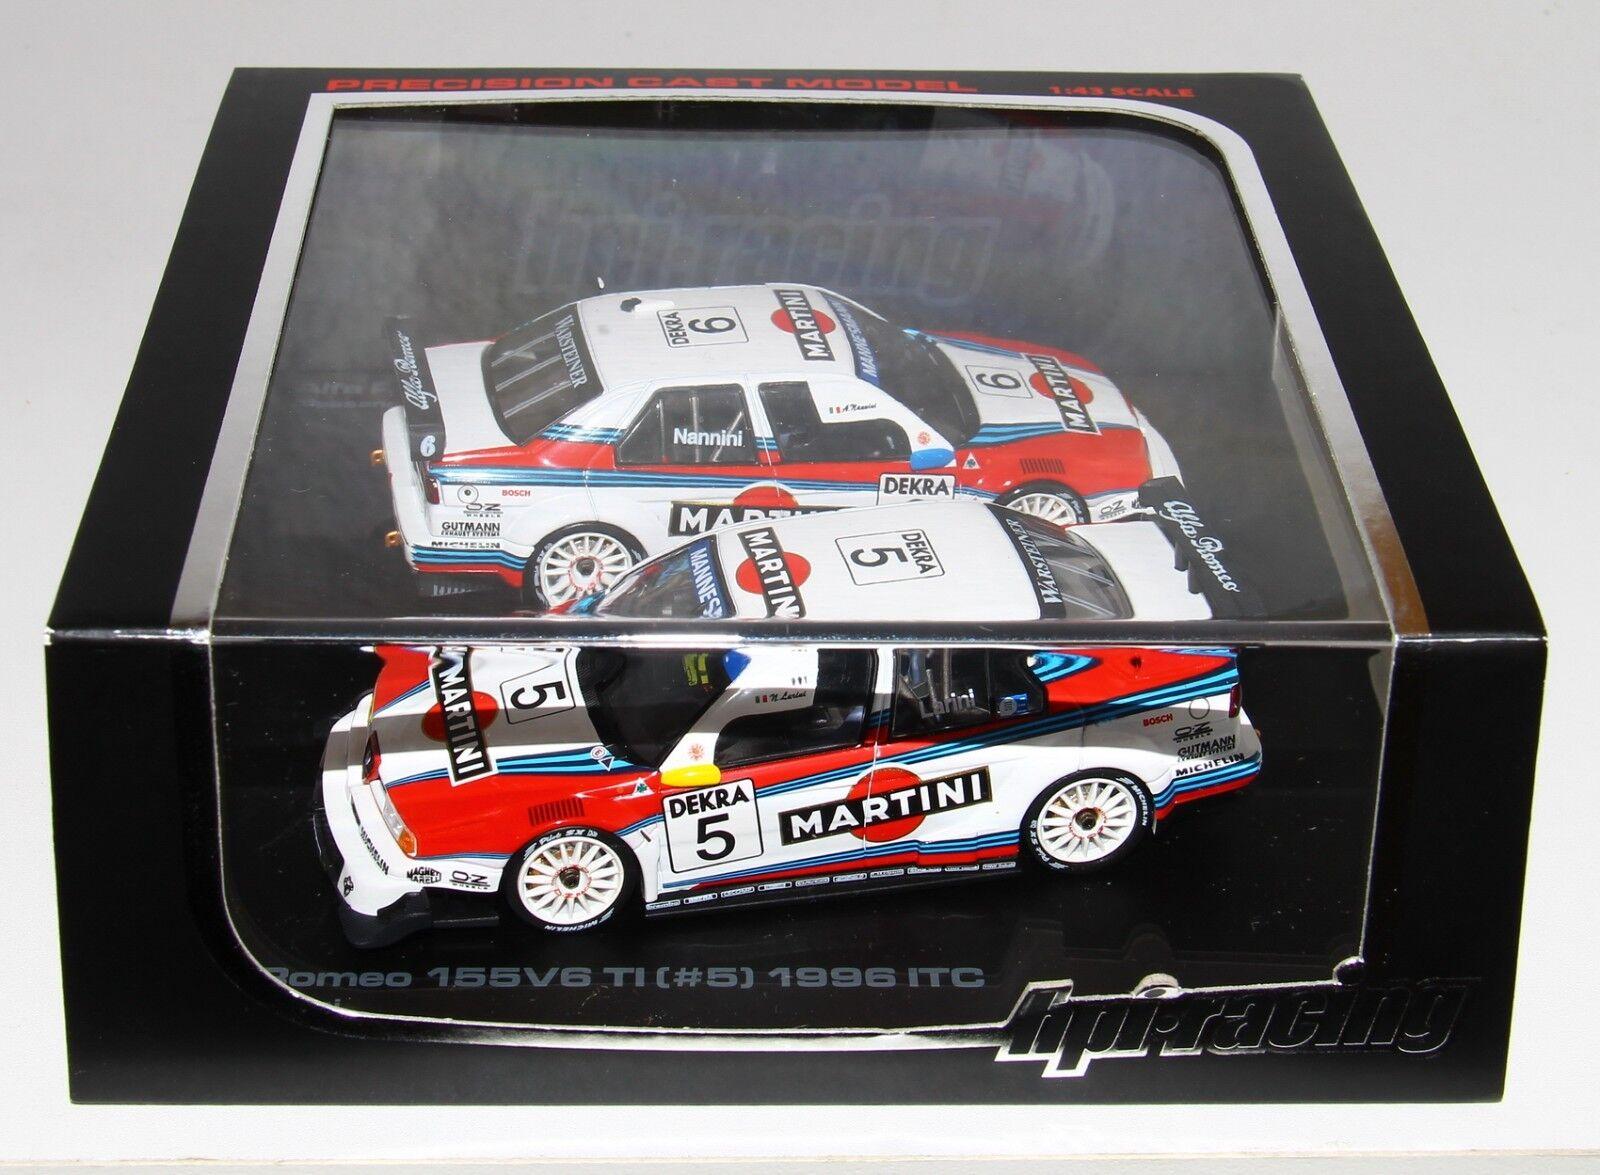 selección larga HPI HPI HPI Racing 8092 1 43 Alfa Romeo 155 V6 TI ( 5 &  6) 1996 ITC Set Larini Nannini  nueva marca